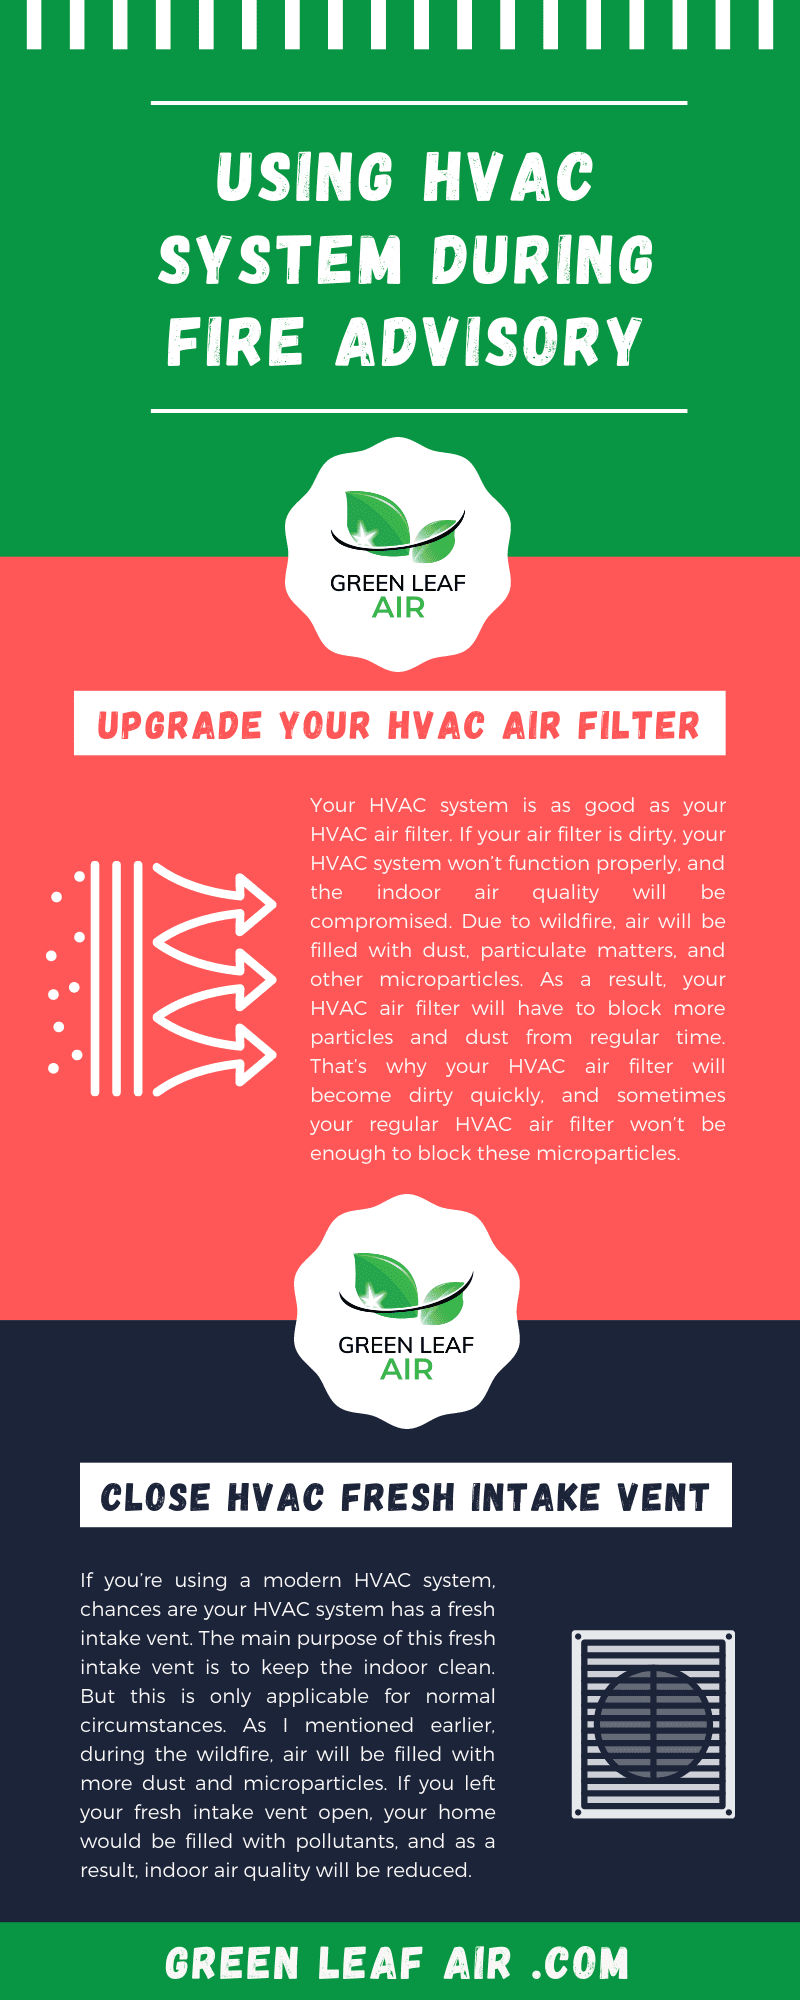 Using HVAC System During Fire Advisory